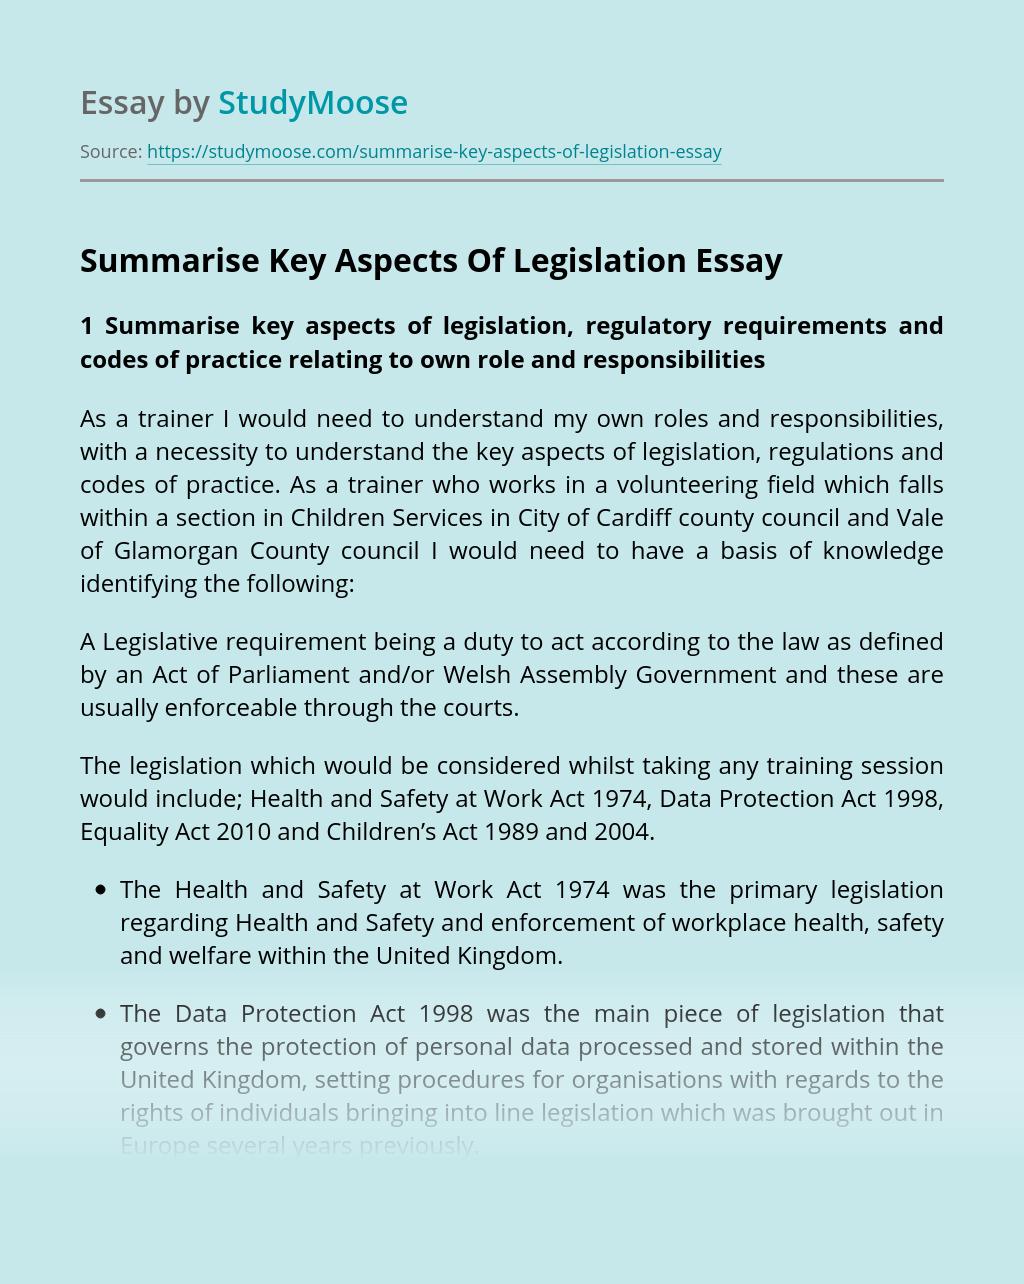 Summarise Key Aspects Of Legislation